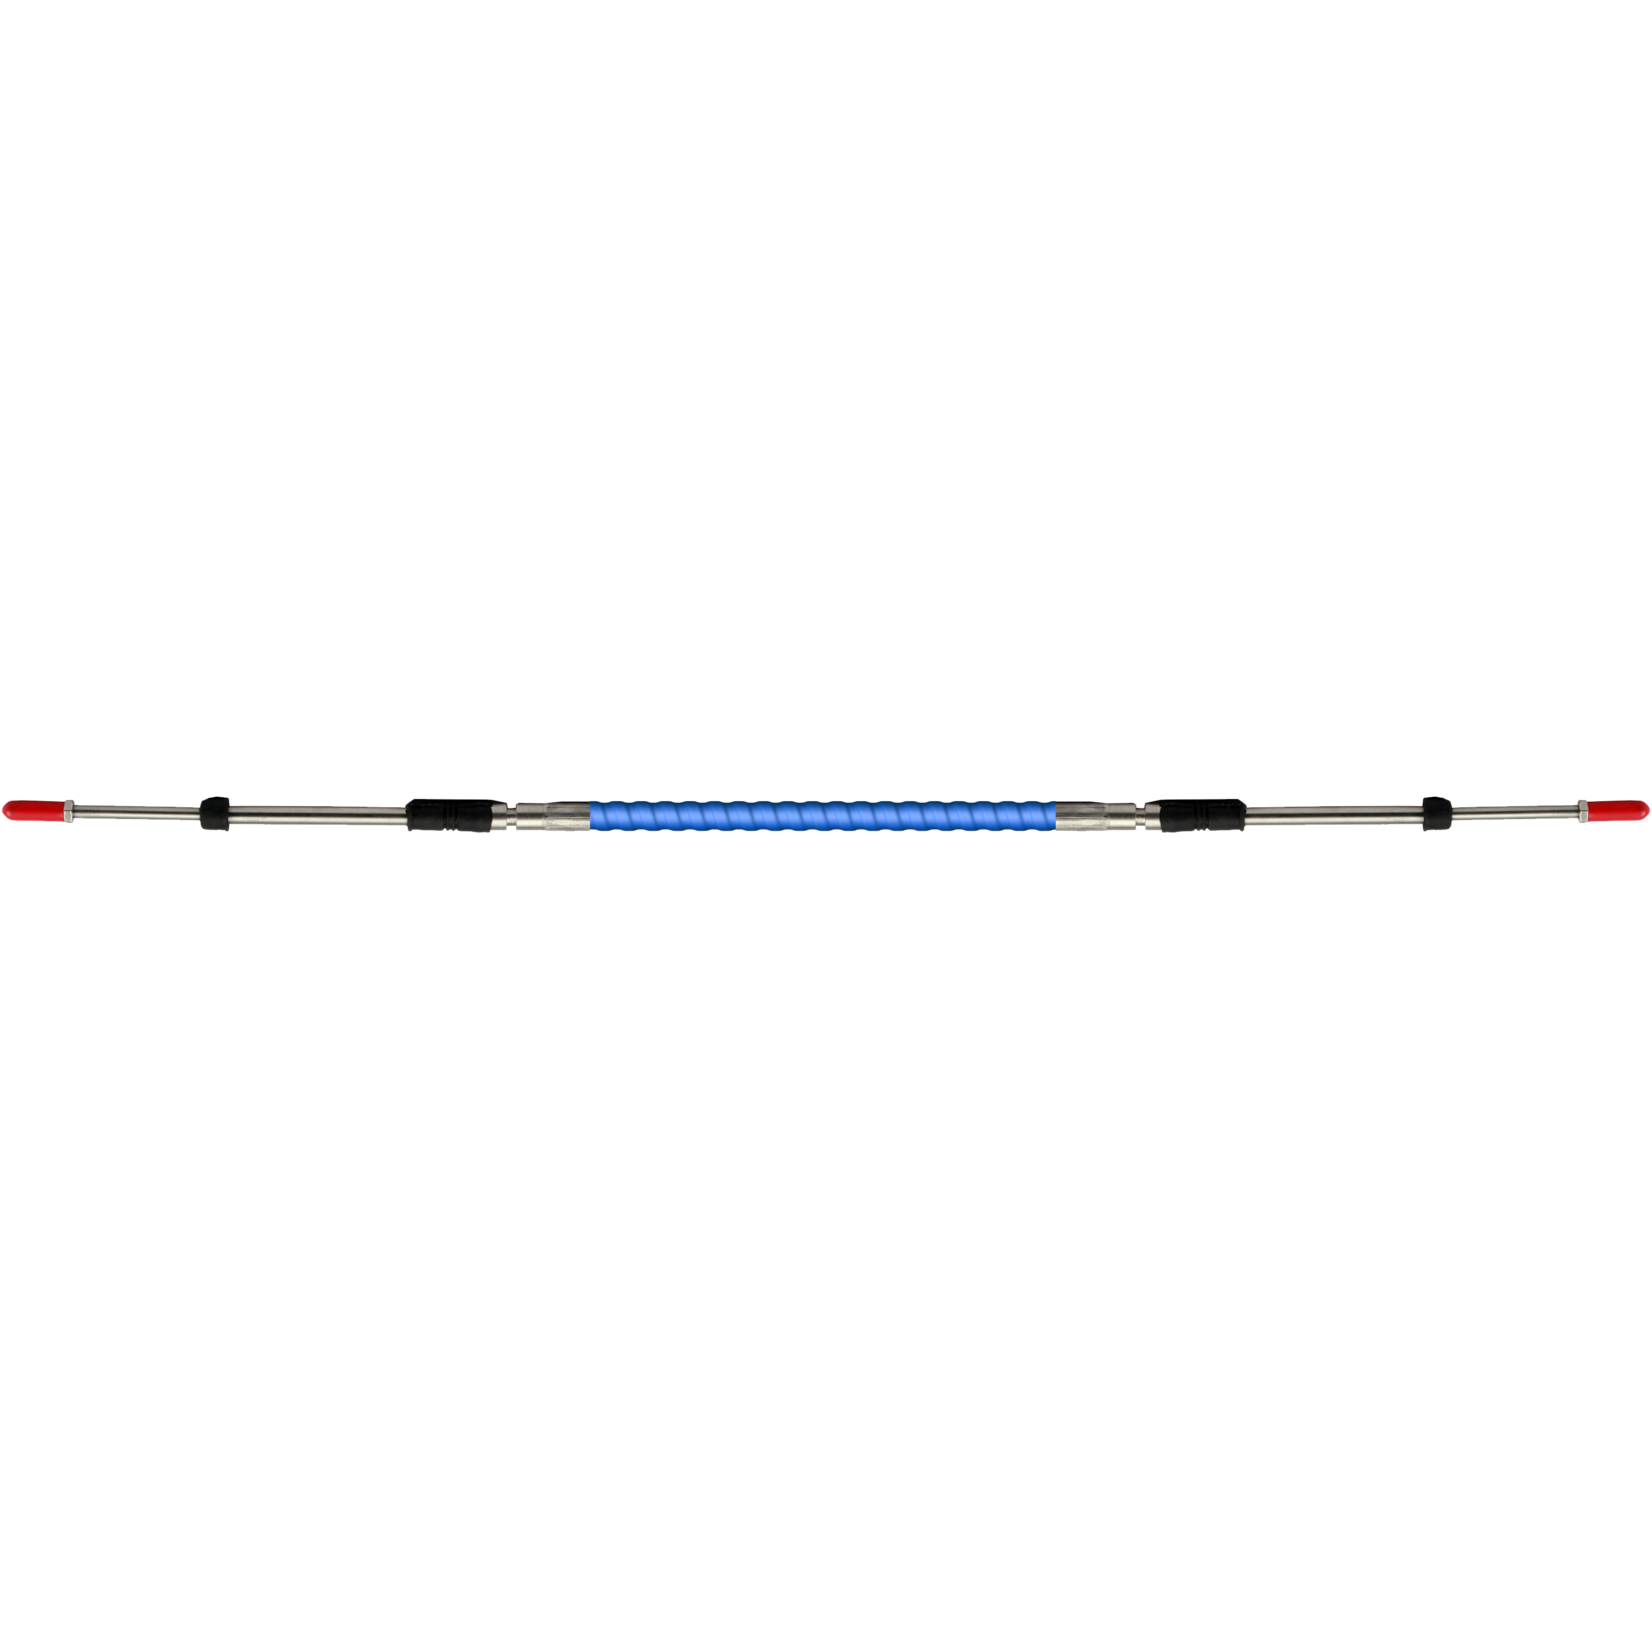 Multiflex Marine  EDGE-motorbesturingskabel - Universal